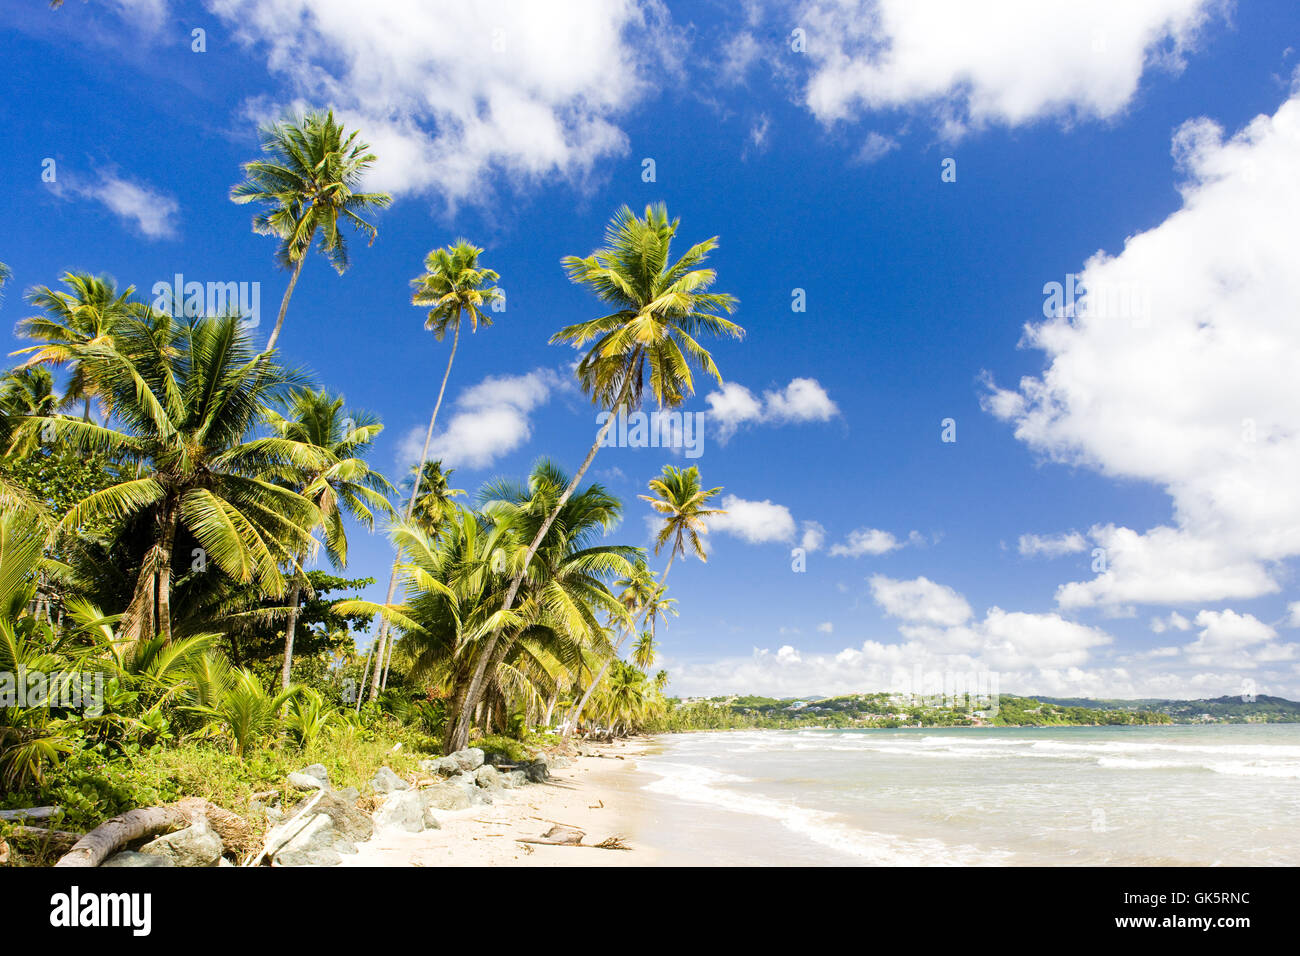 Paisaje paisaje paisaje Imagen De Stock